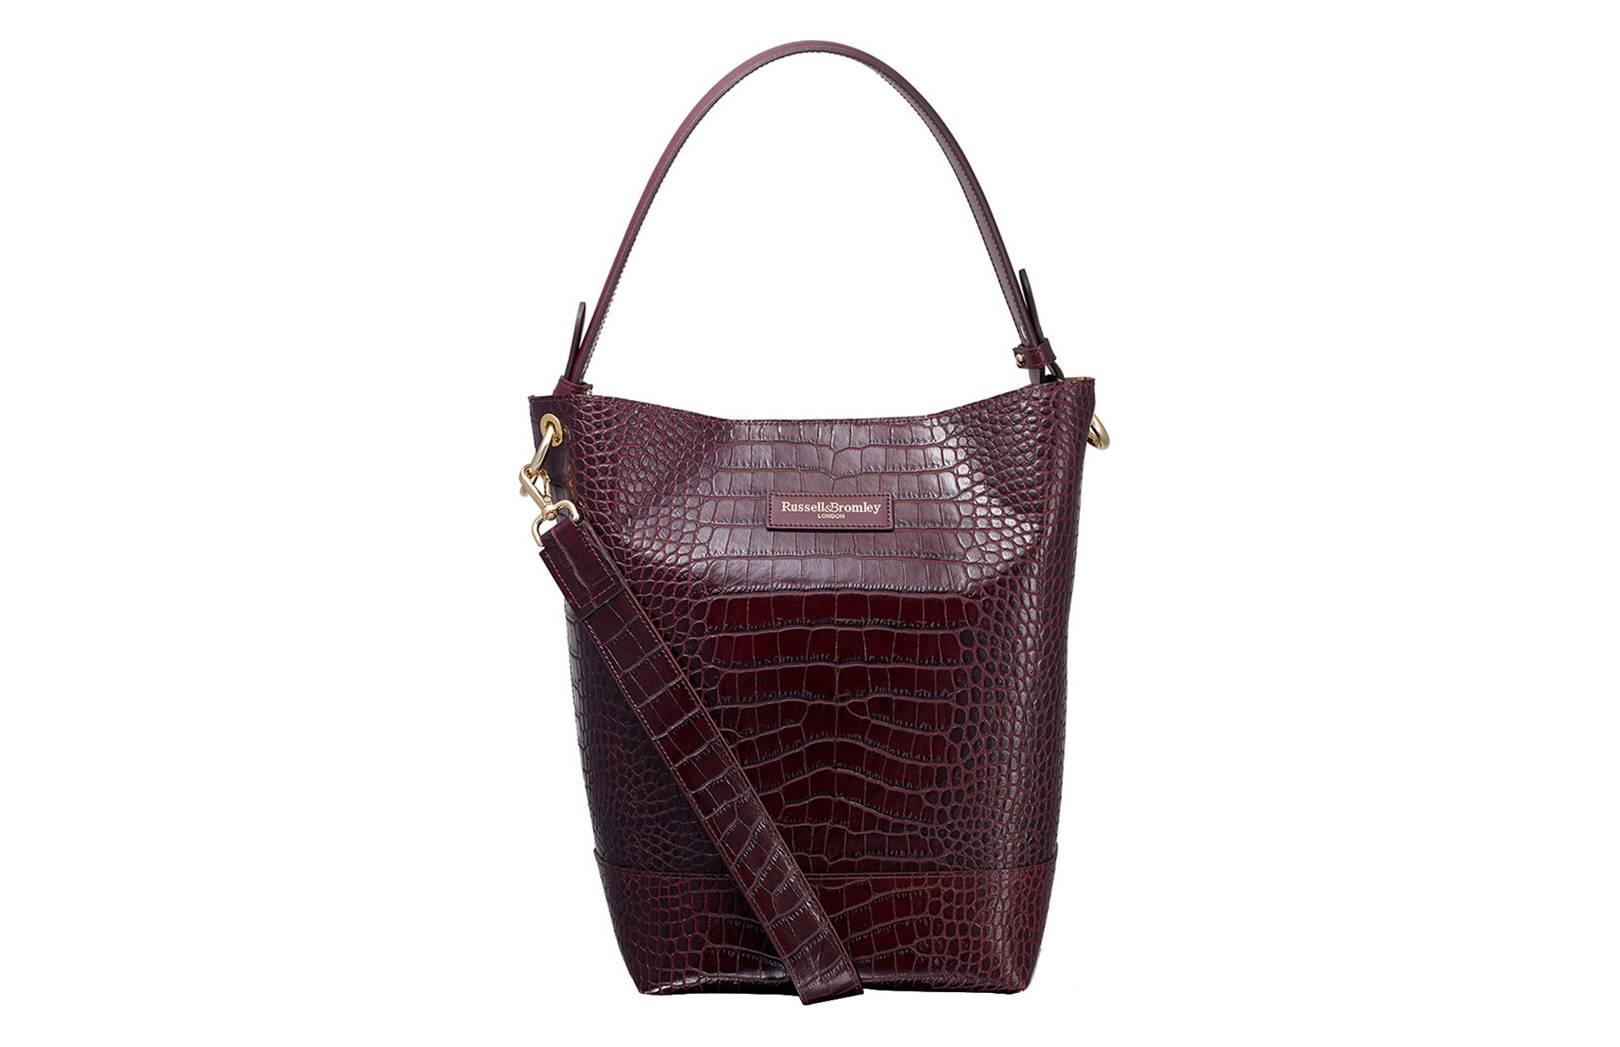 c639cf35d7c Best Bags Under £300